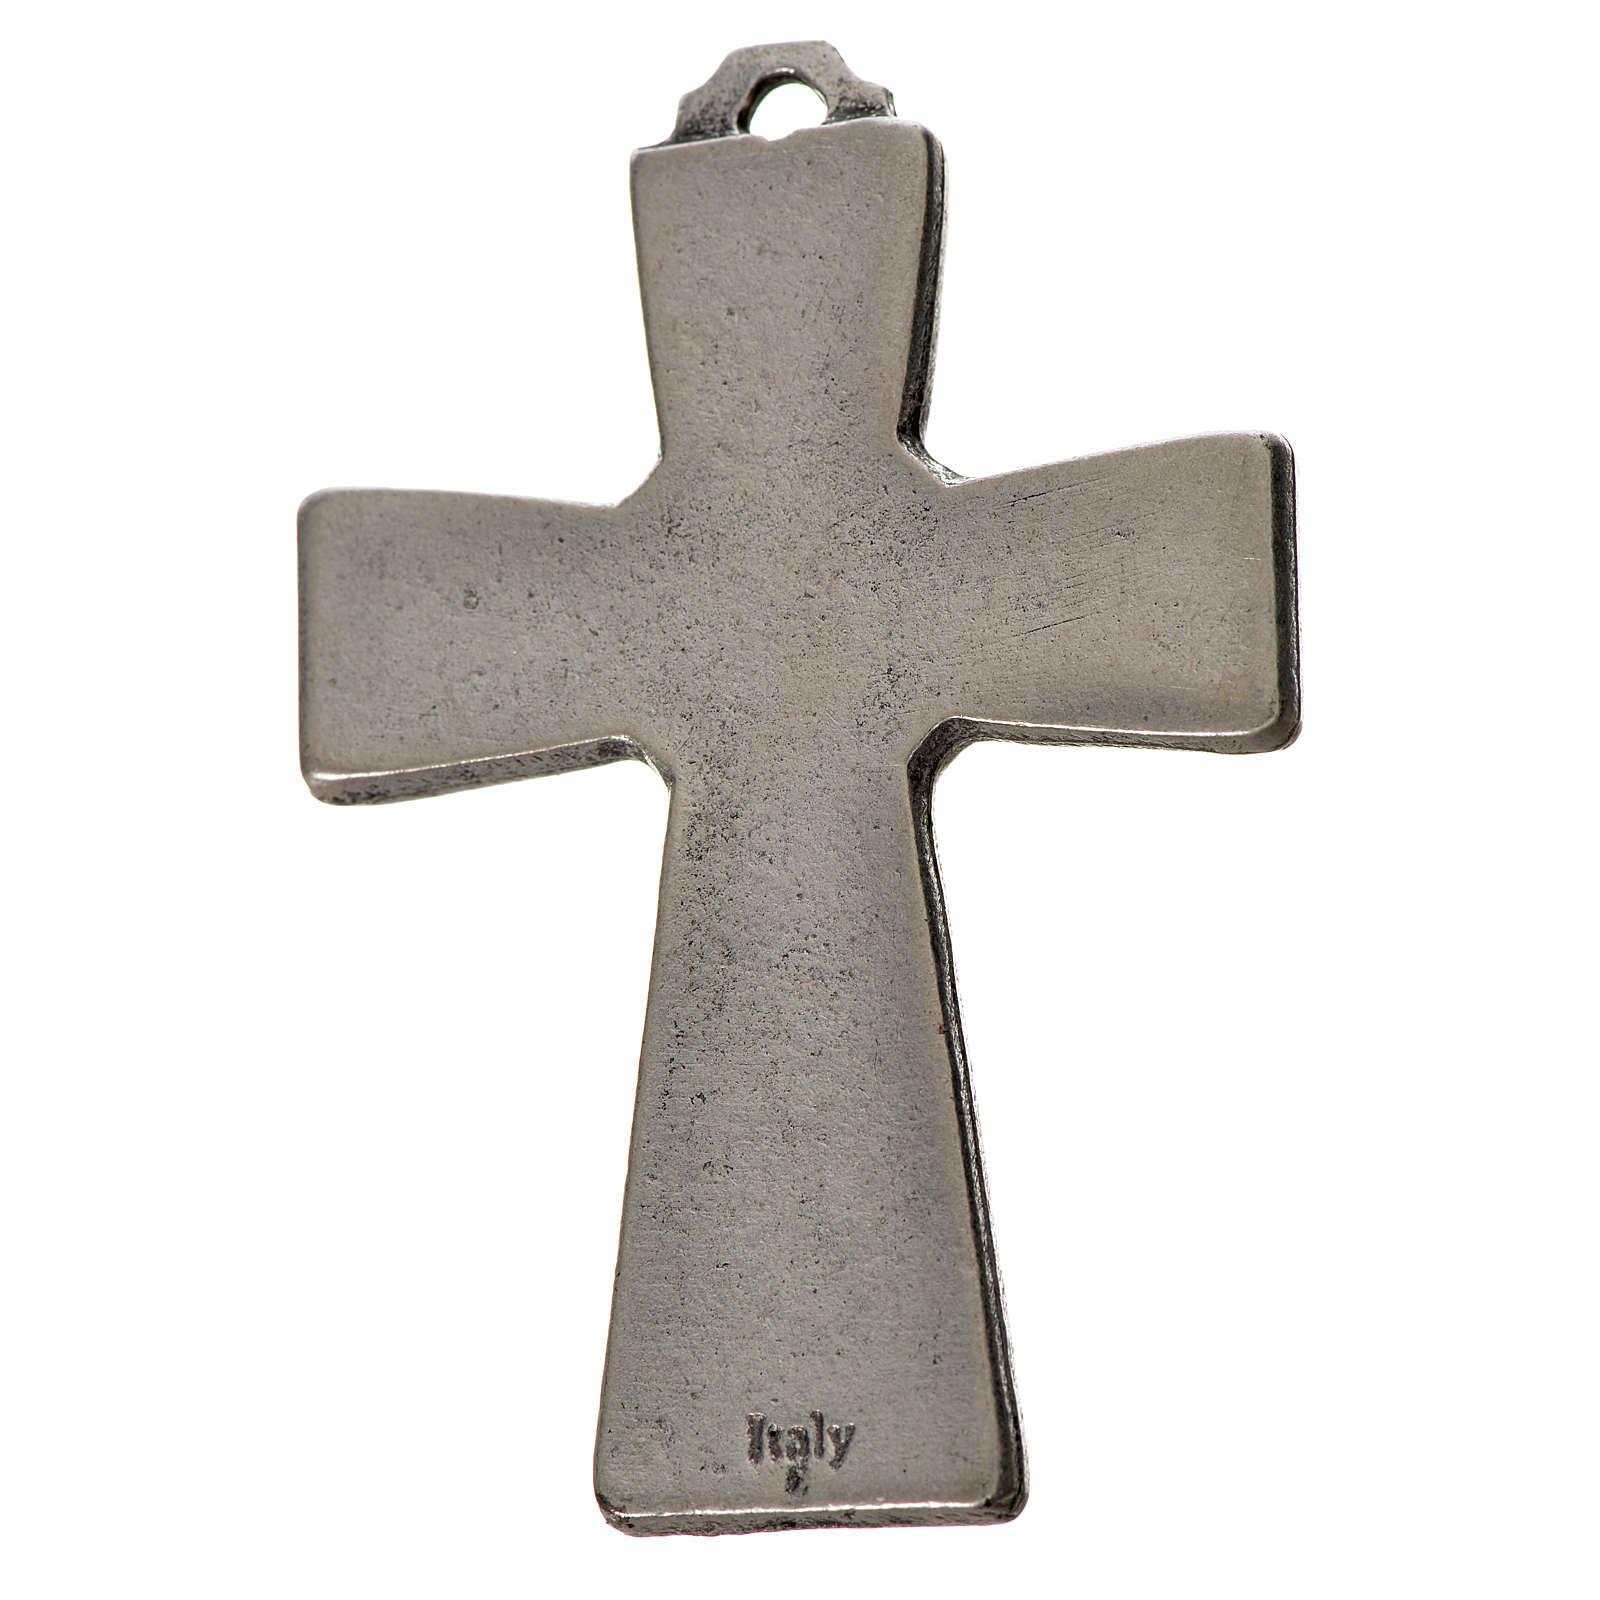 Holy Spirit cross 5x3.5cm in zamak, white enamel 4